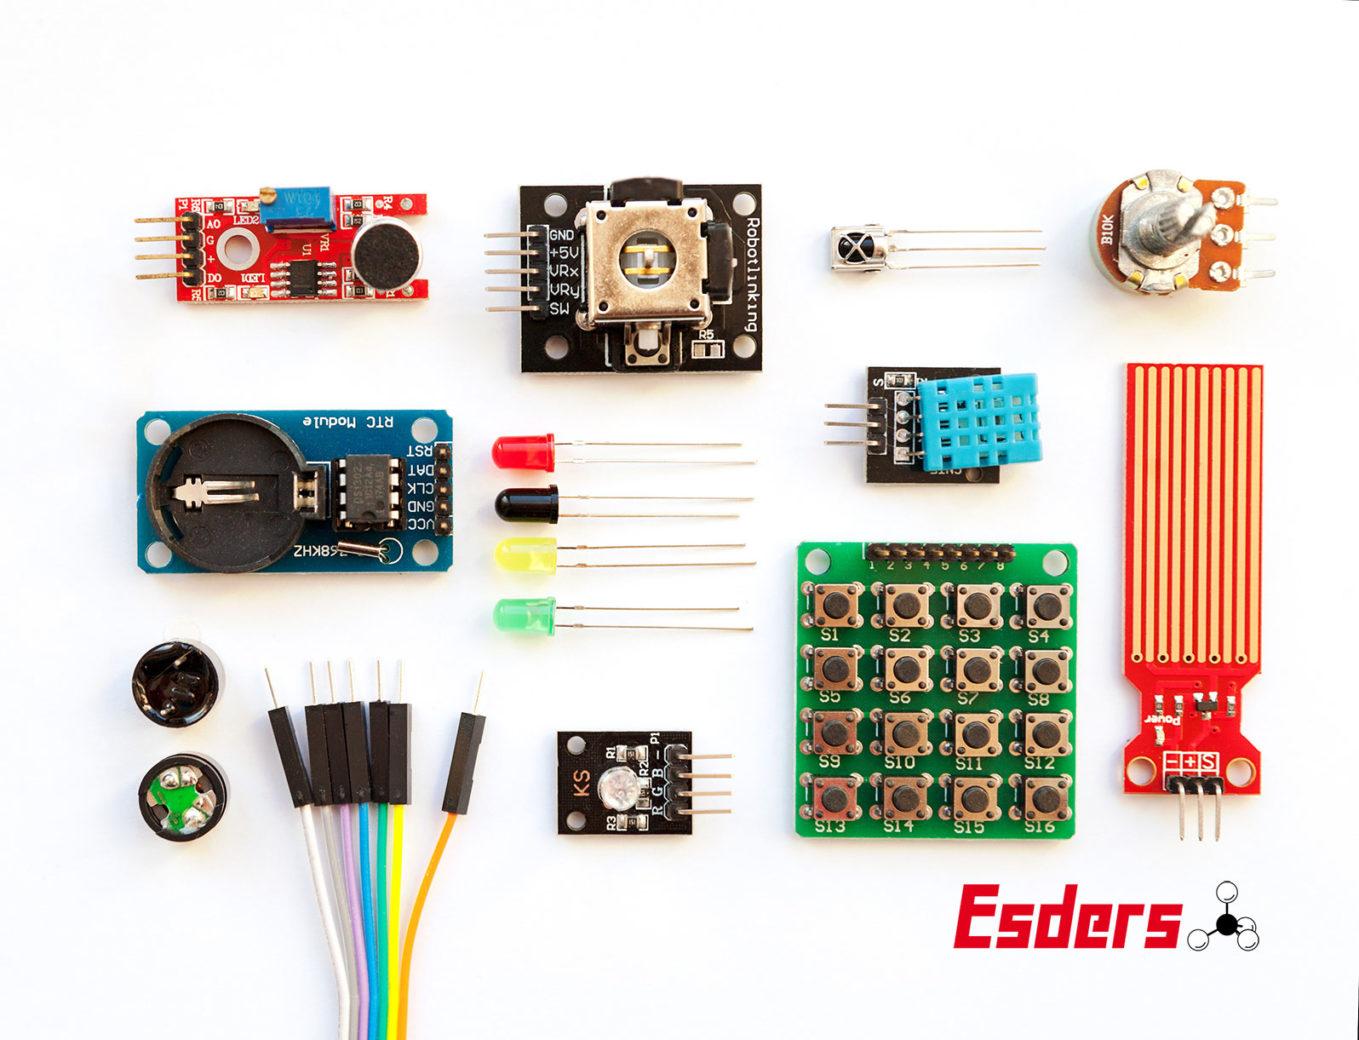 Sensor principles explained